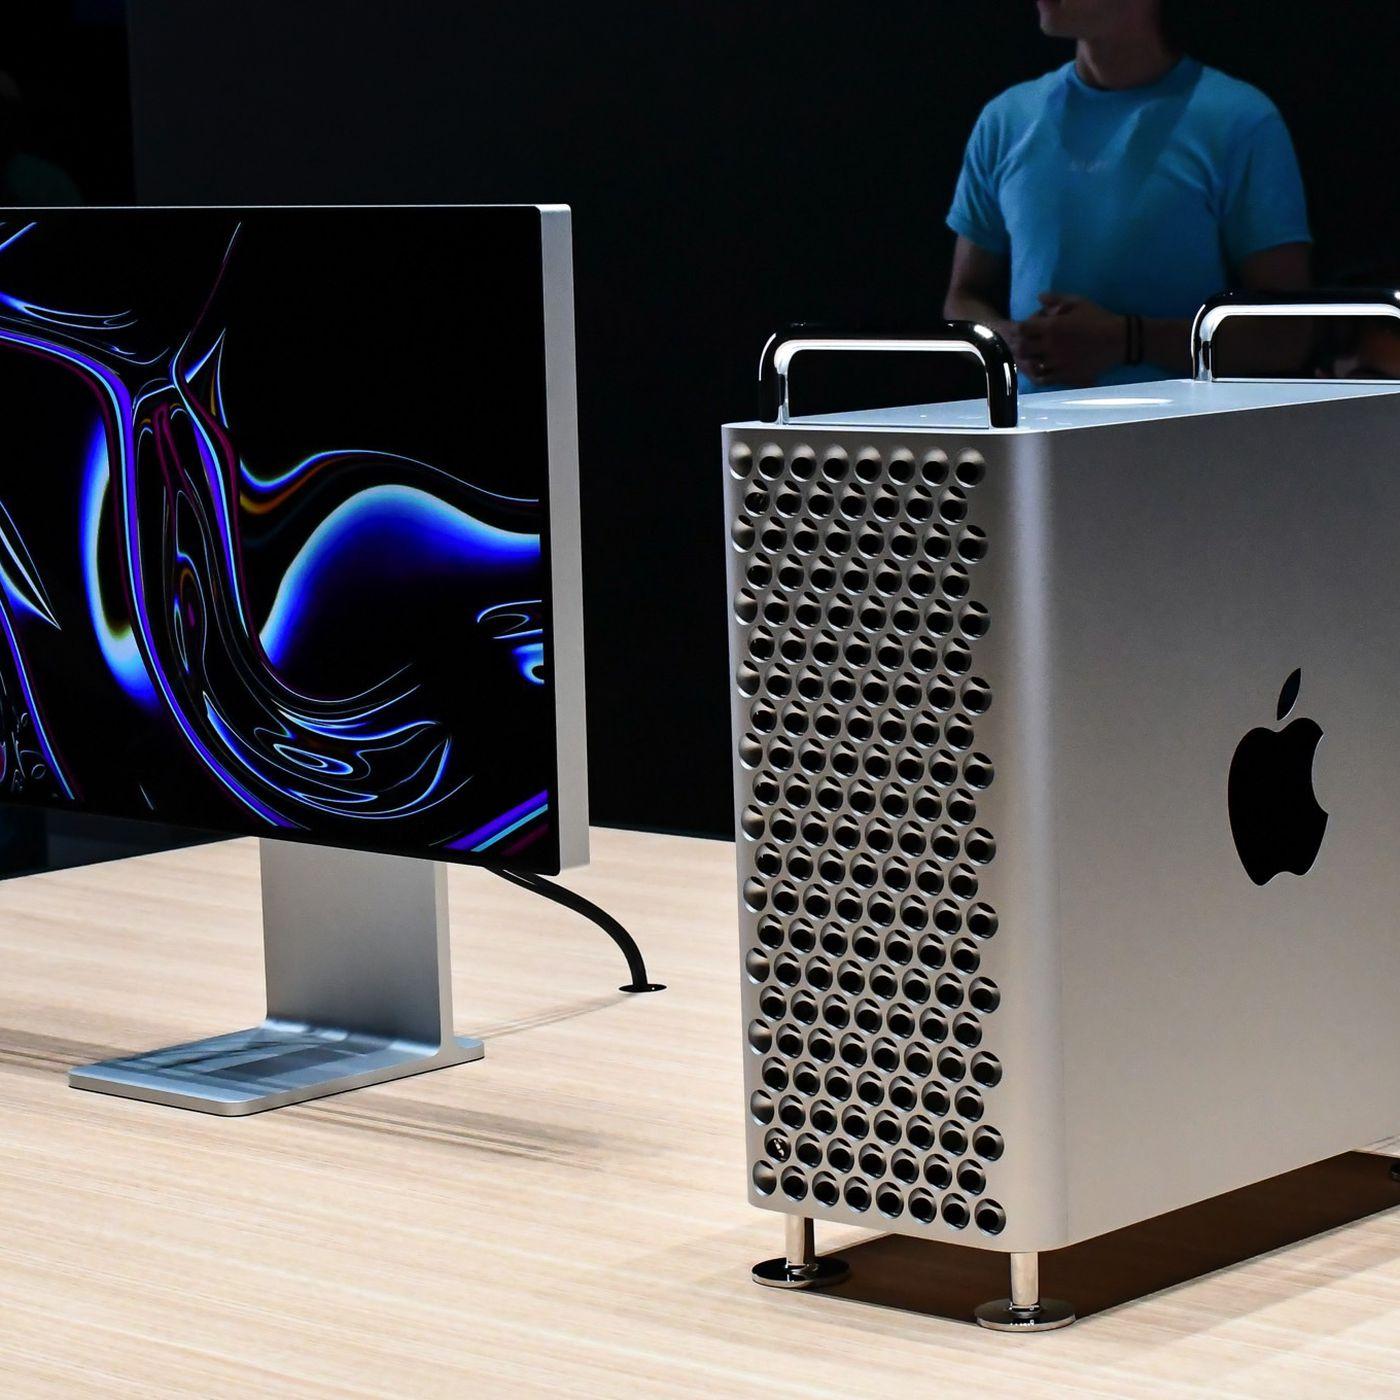 new apple gadgets